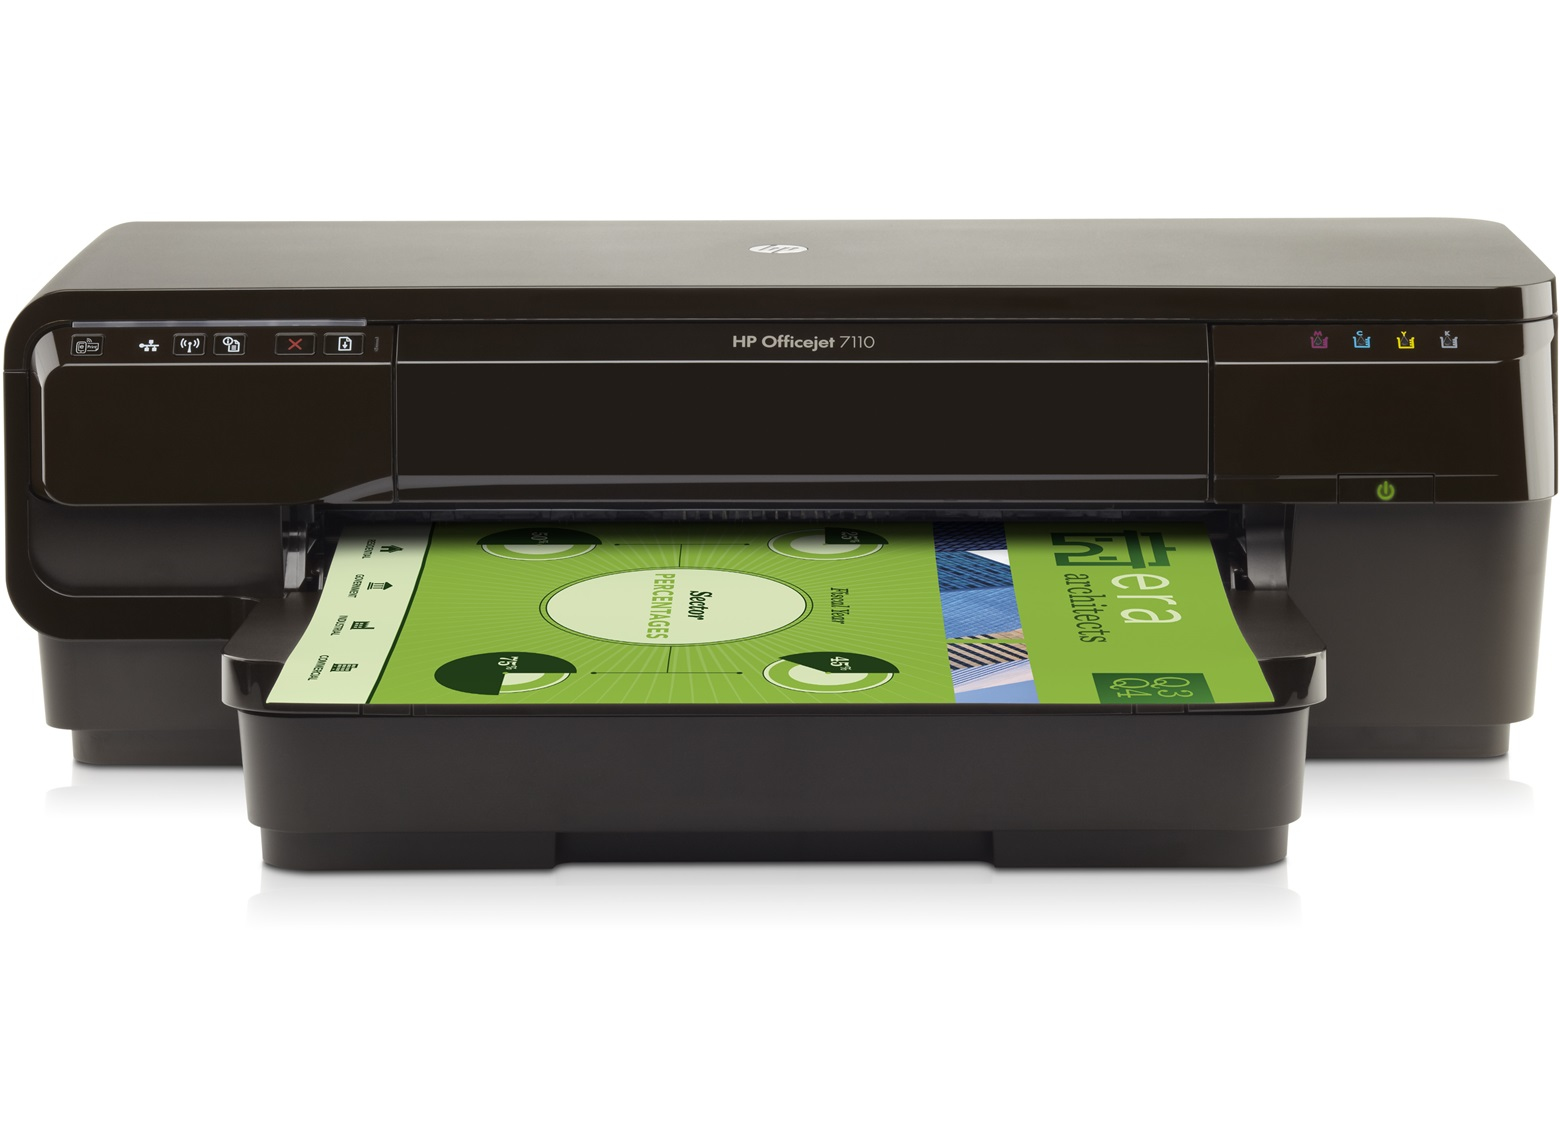 HP Color LaserJet Officejet 7110 Wide Format ePrinter - Großformatdrucker Farbig Tintenstrahldruck - 1.200 dpi - 8 ppm